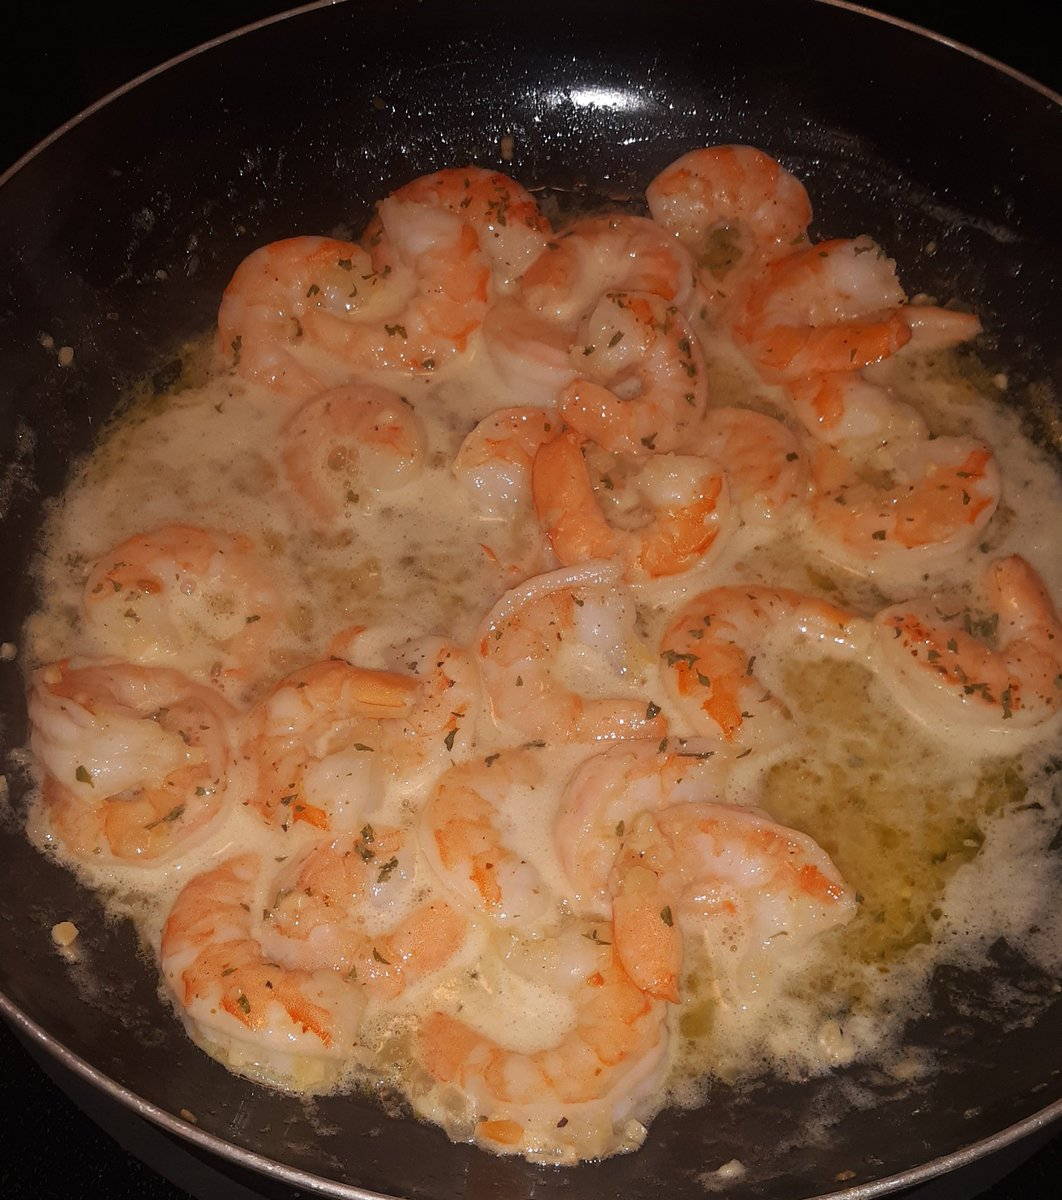 Celebratory #STARSWIN shrimp scampi tonight!!!! Go Dallas, #GOSTARS